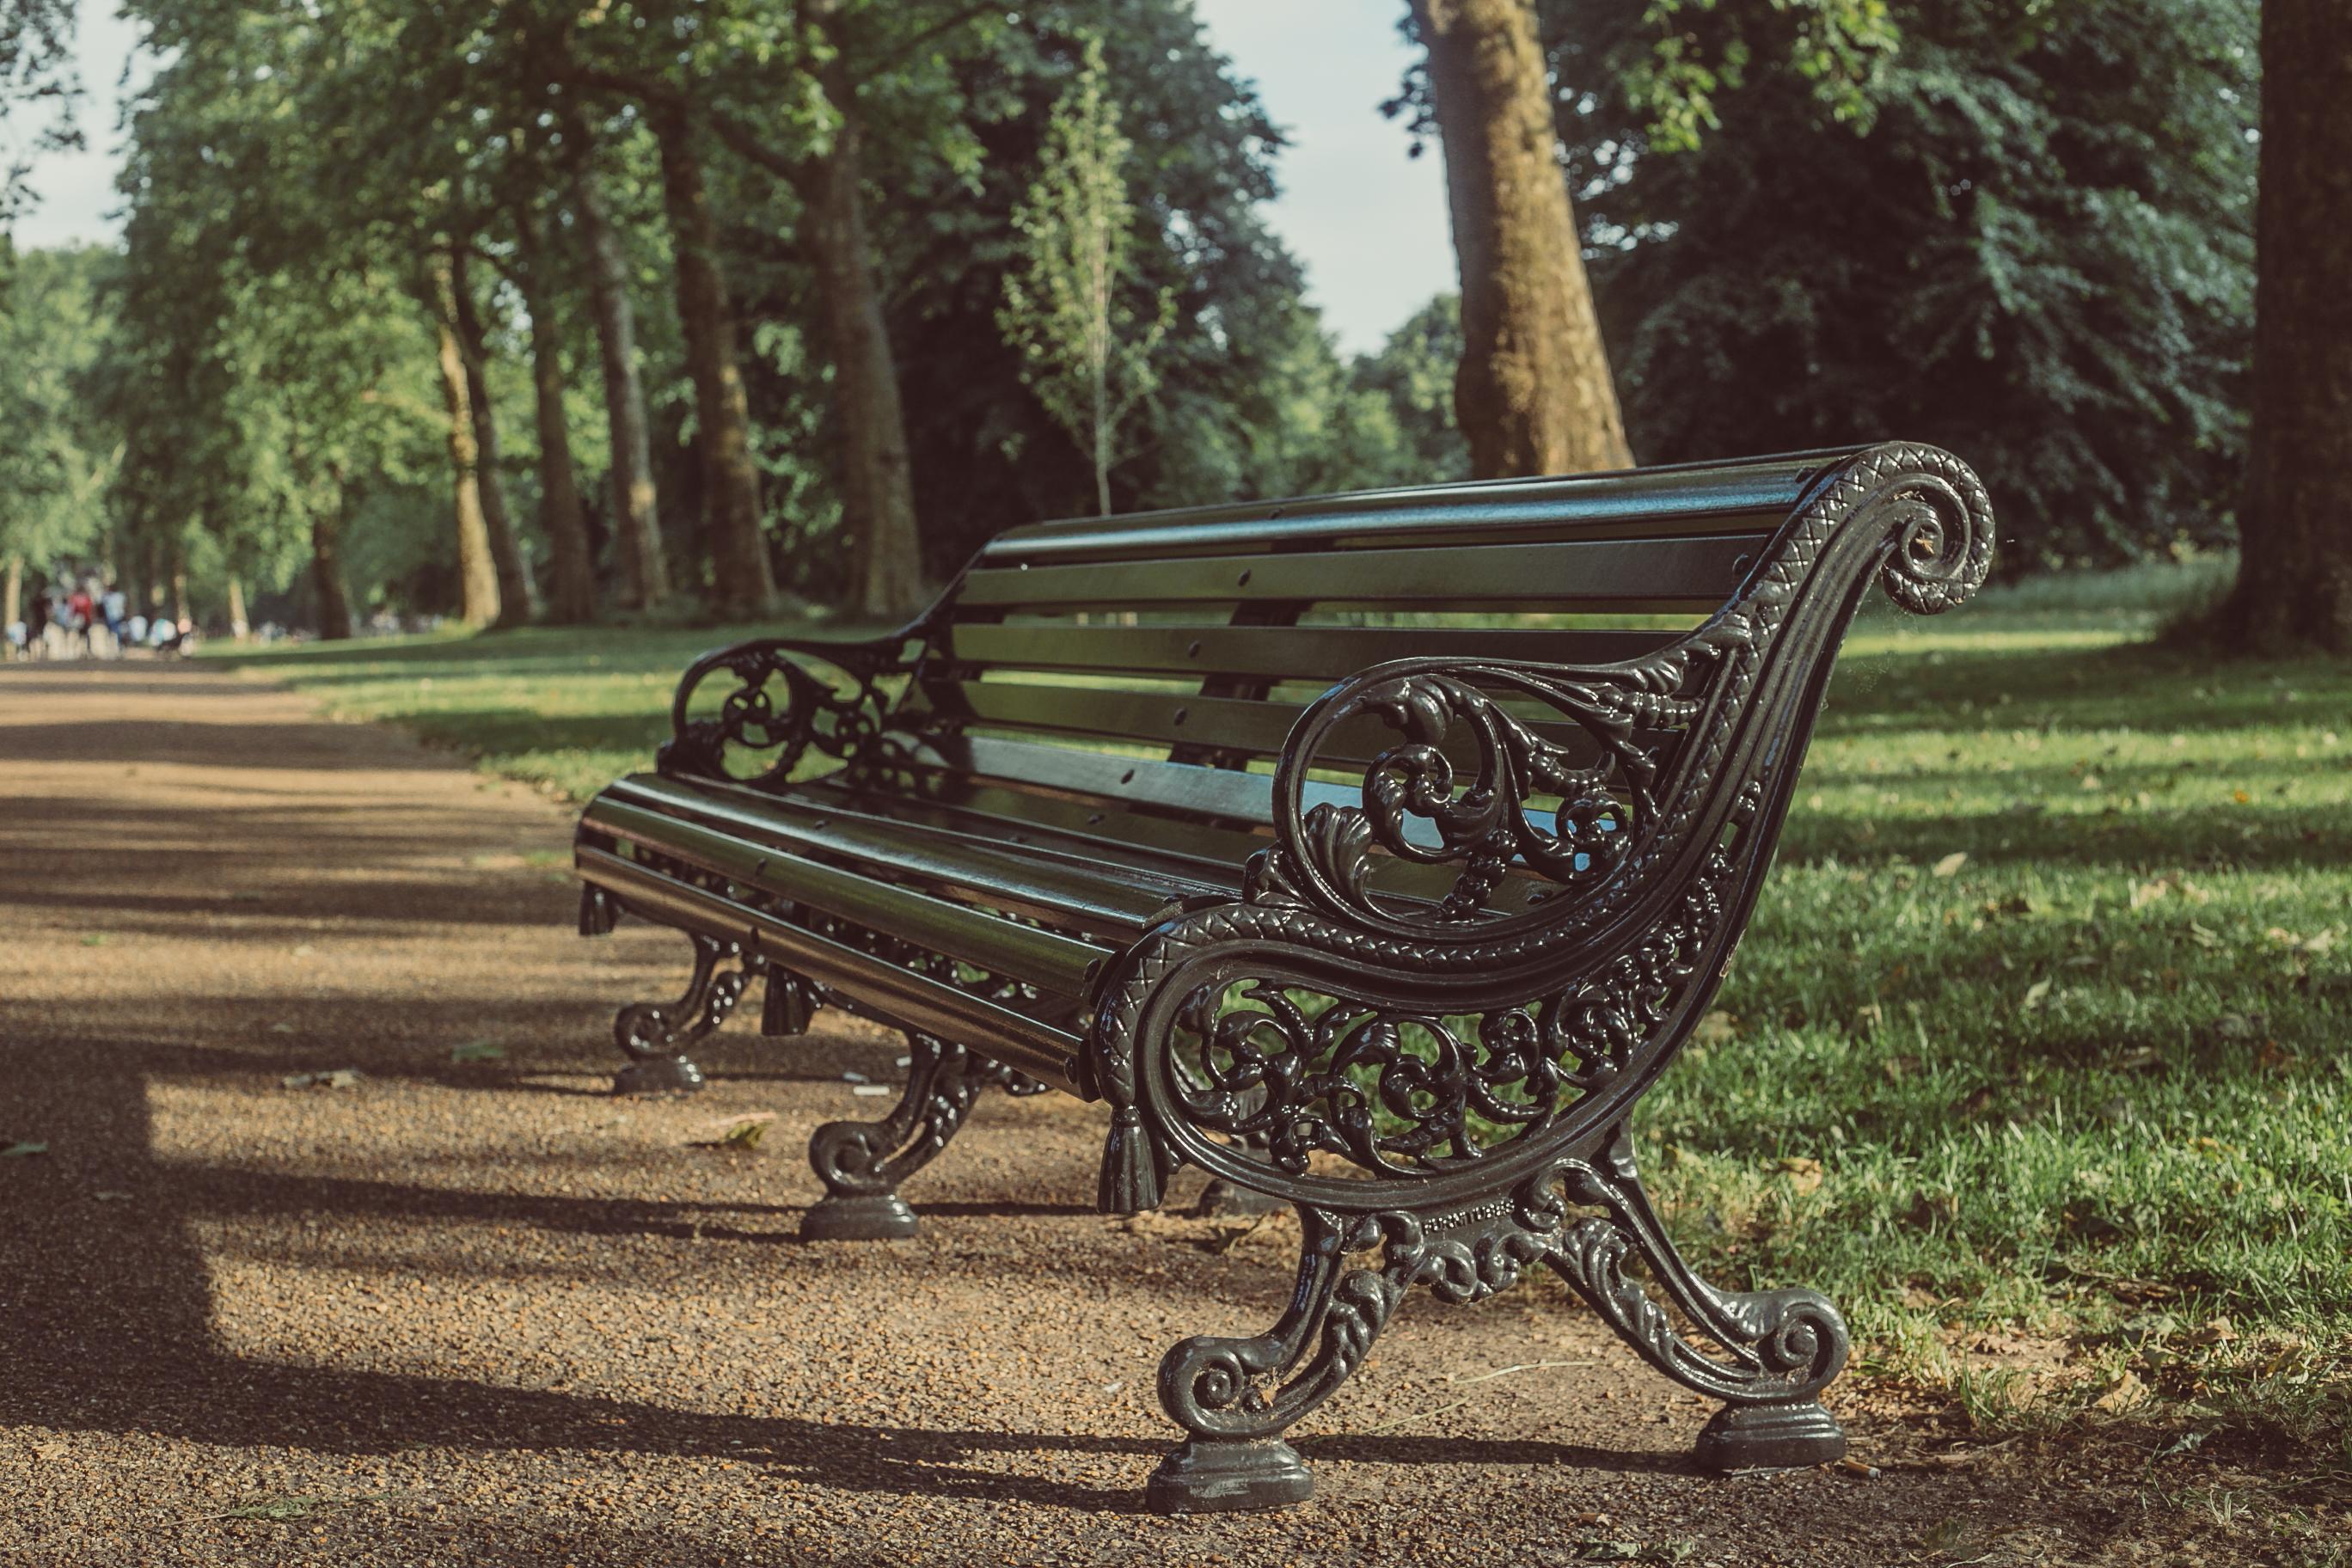 8800 Koleksi Cara Gambar Kursi Taman Gratis Terbaik